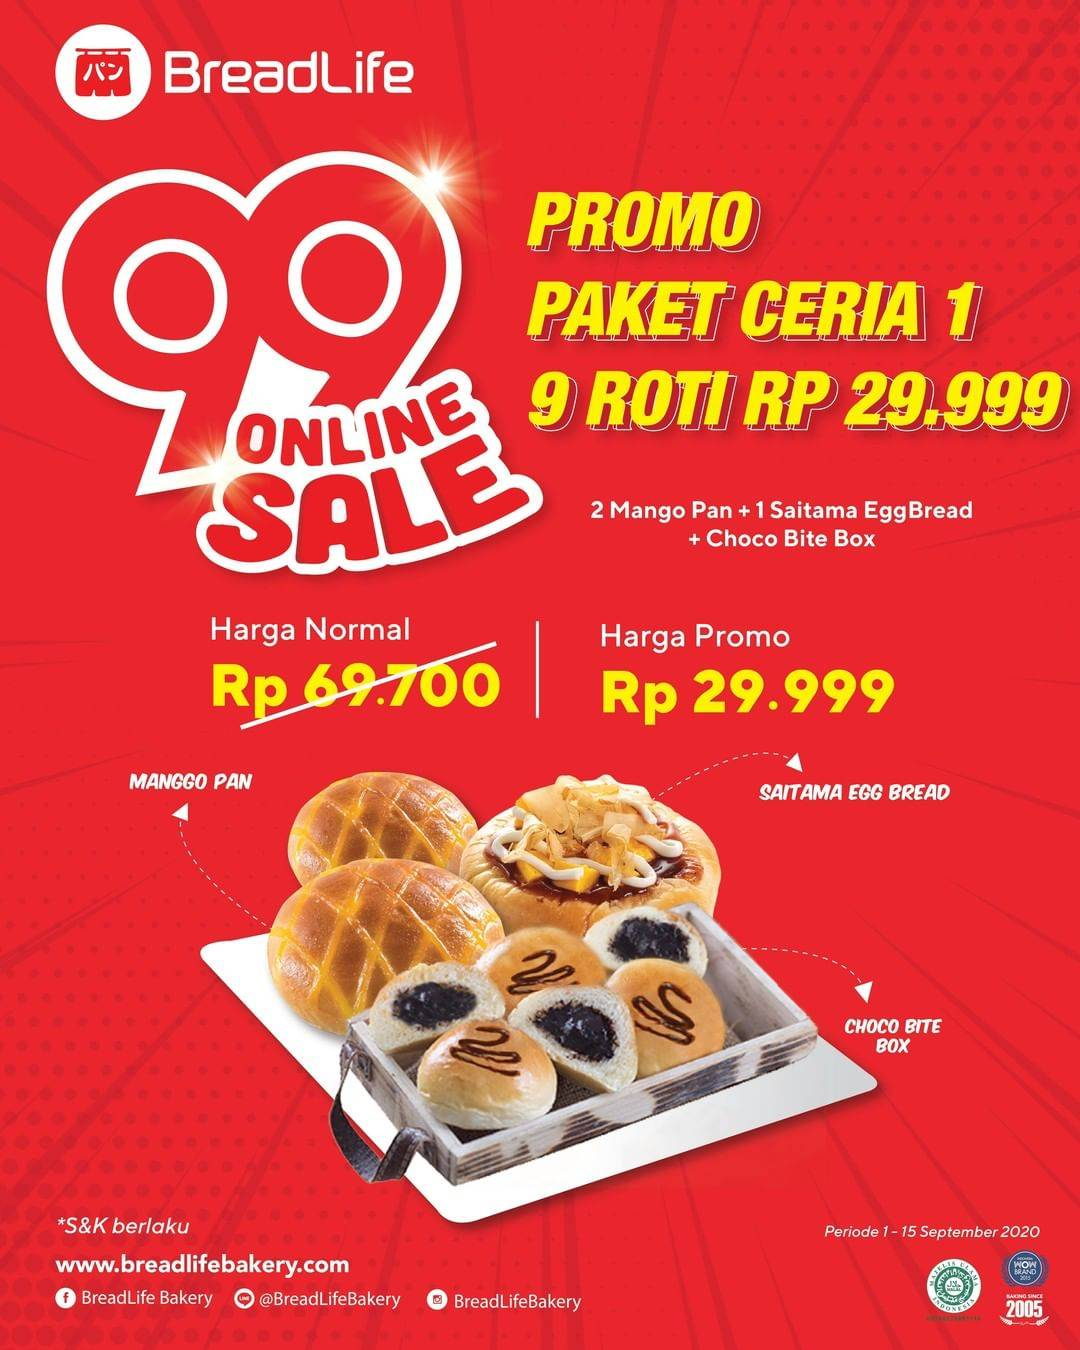 Diskon Breadlife 99 Online Sale - Promo Paket Ceria